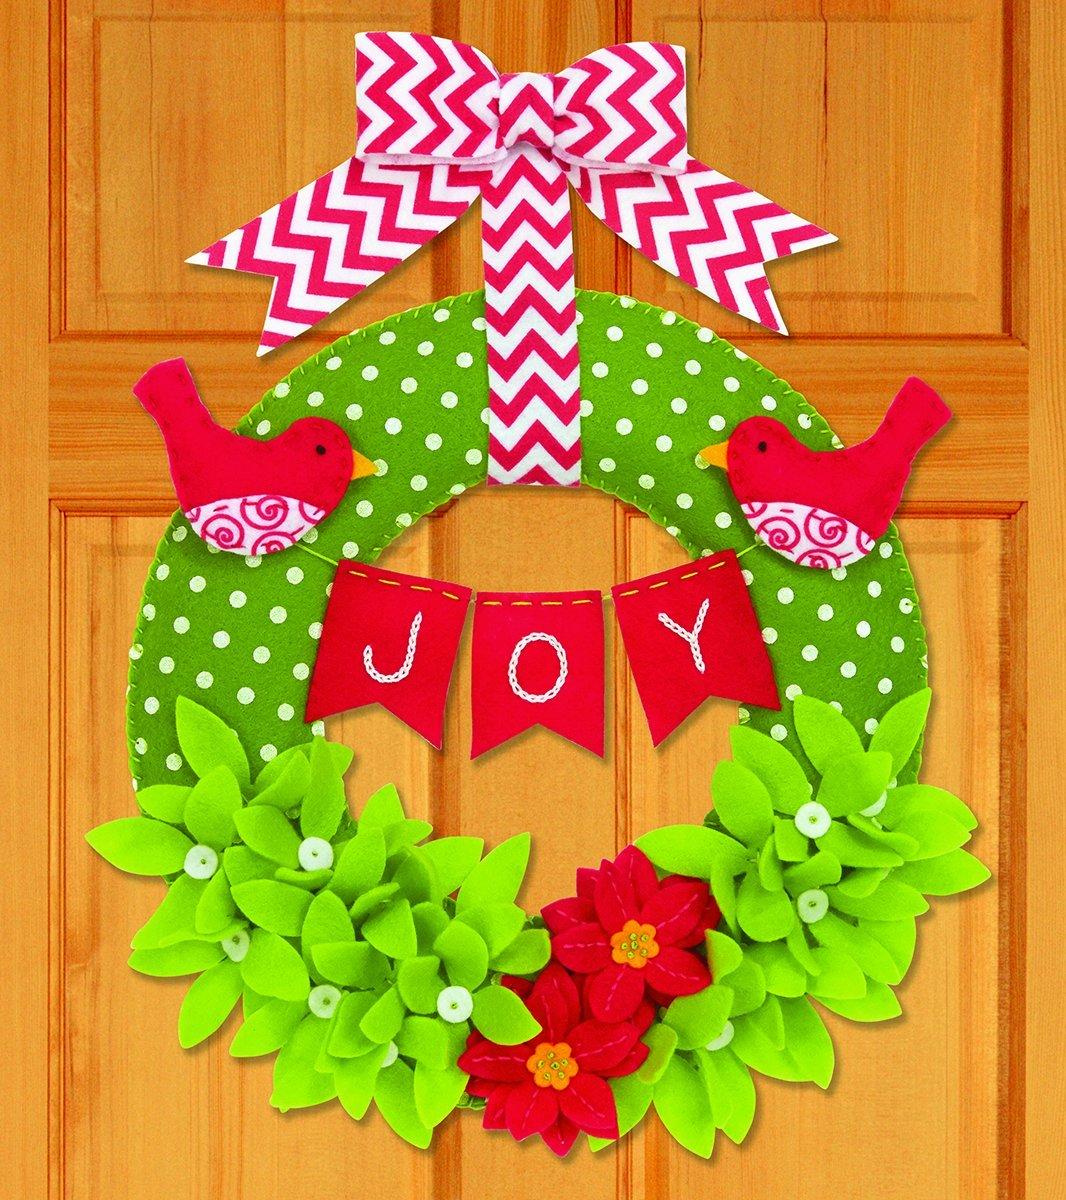 Dimensions Crafts 72-08272 Needlecraft Joy Wreath in Felt Applique CHAIN WIT CORPORATION